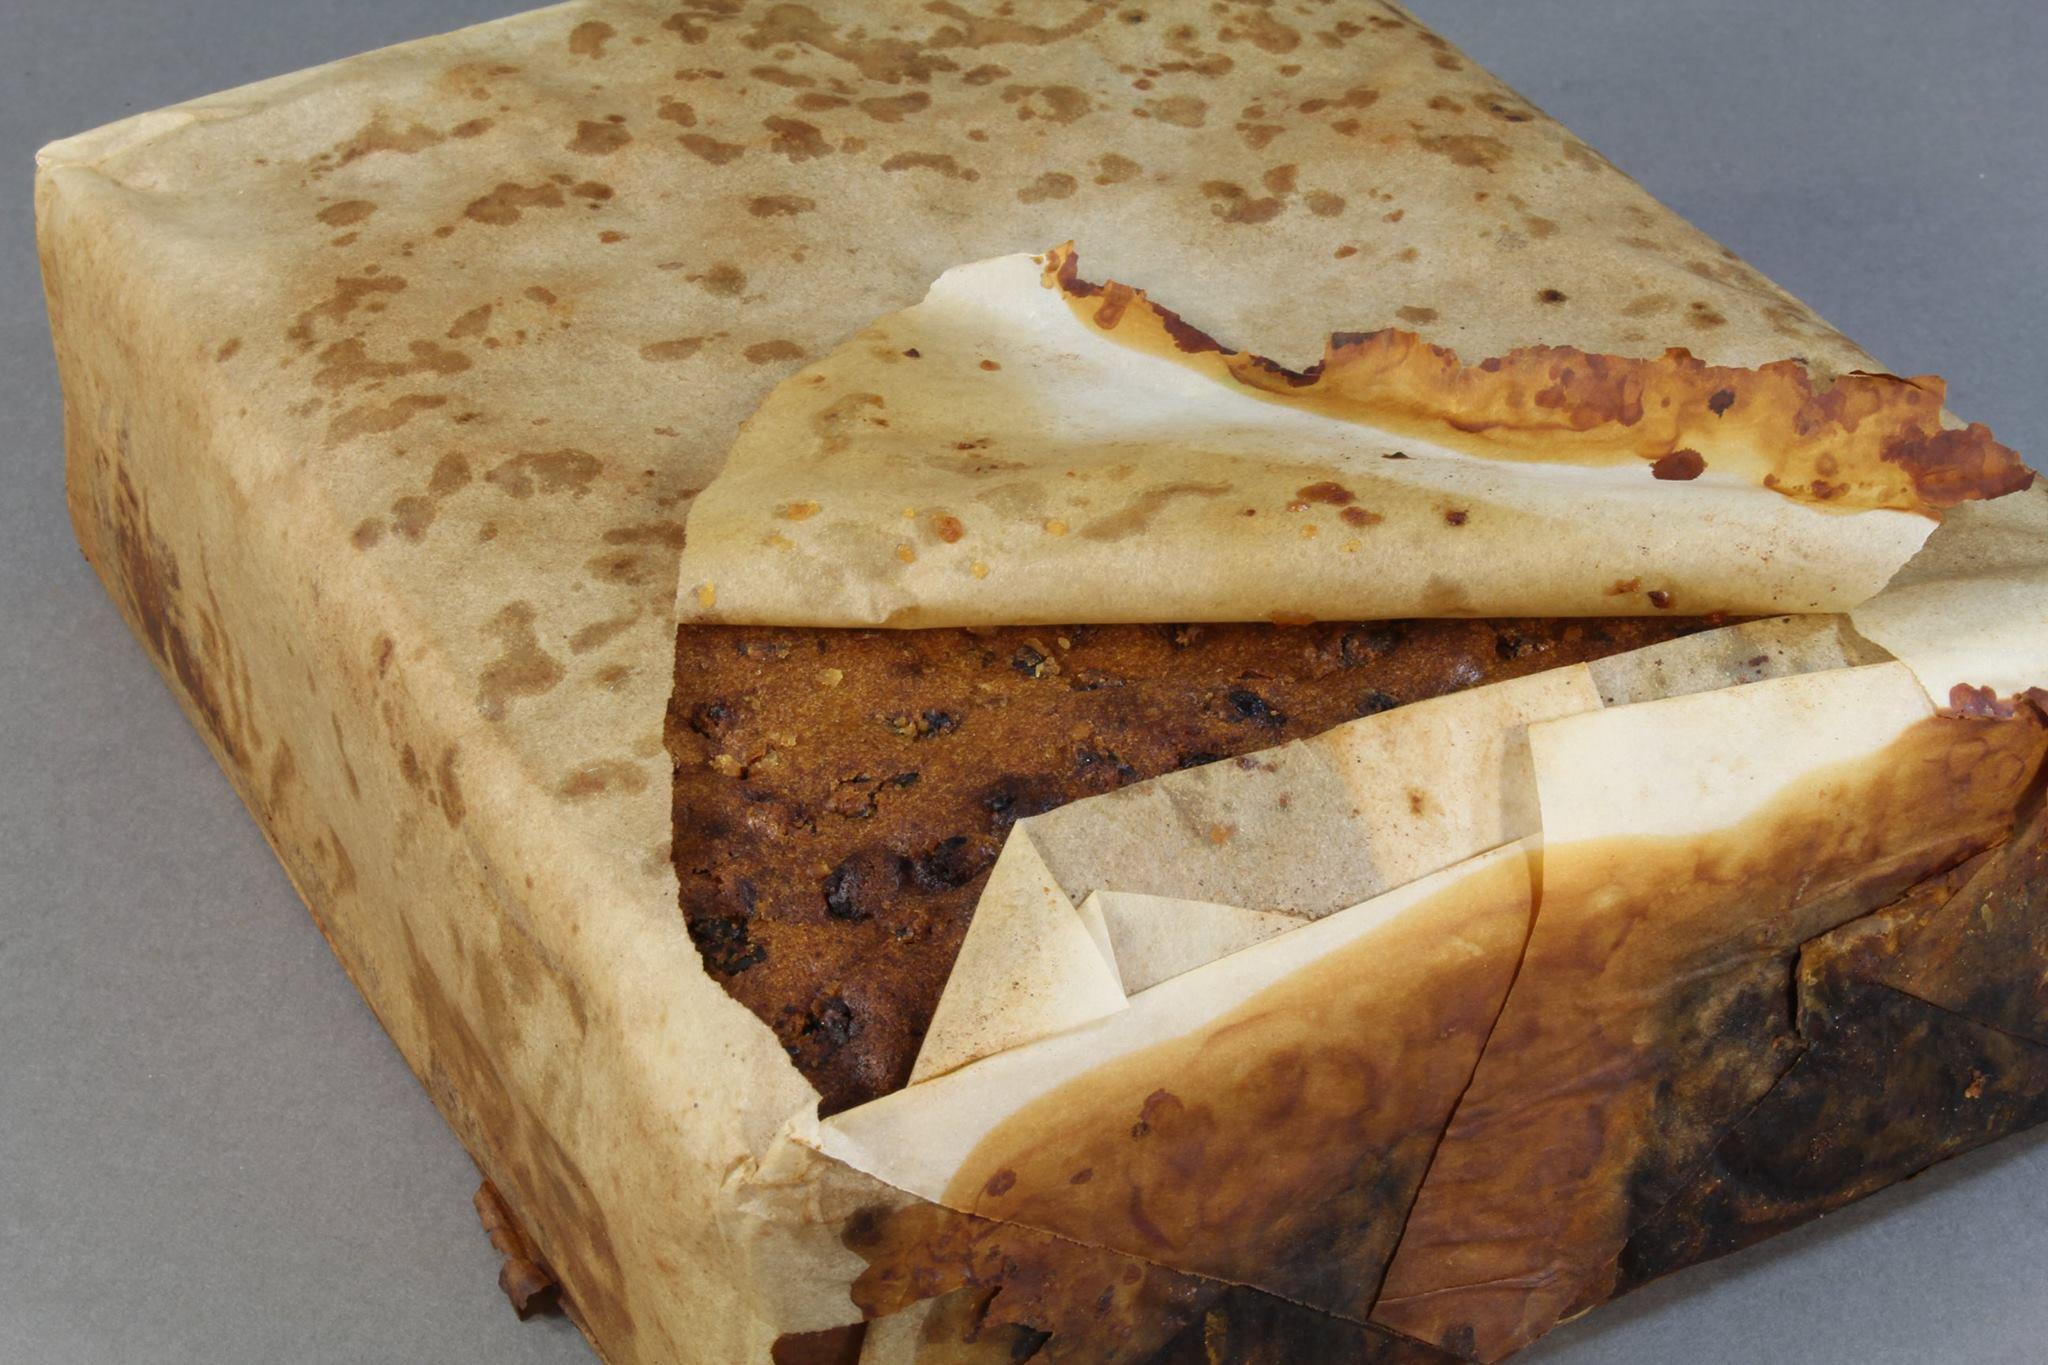 Explorer's 100-year-old fruitcake found in Antarctica in 'excellent condition'